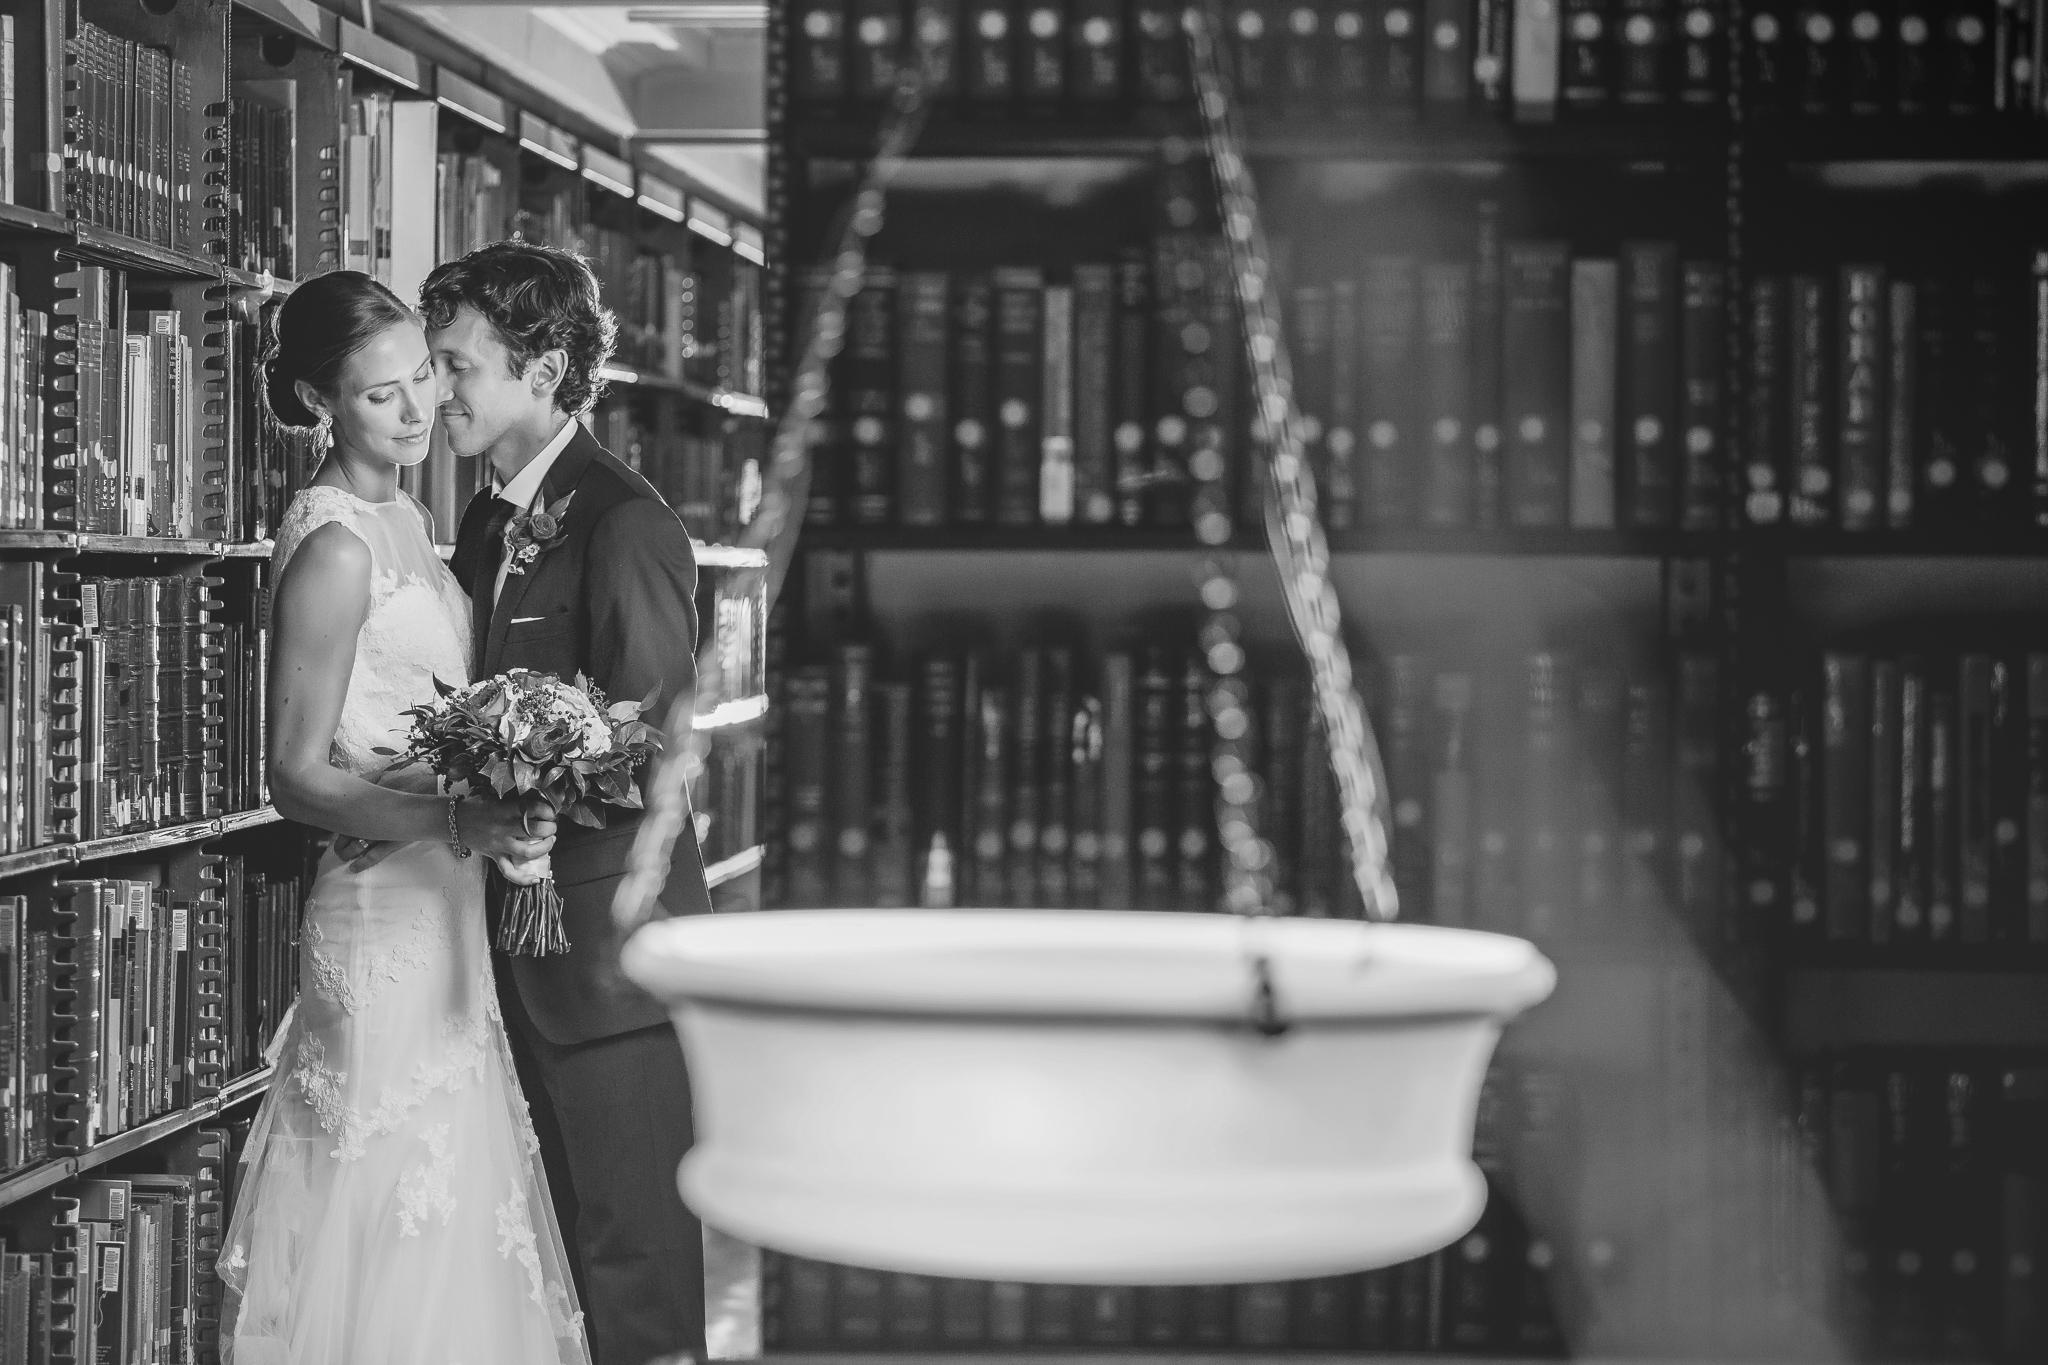 james j hill library wedding photography-24.jpg